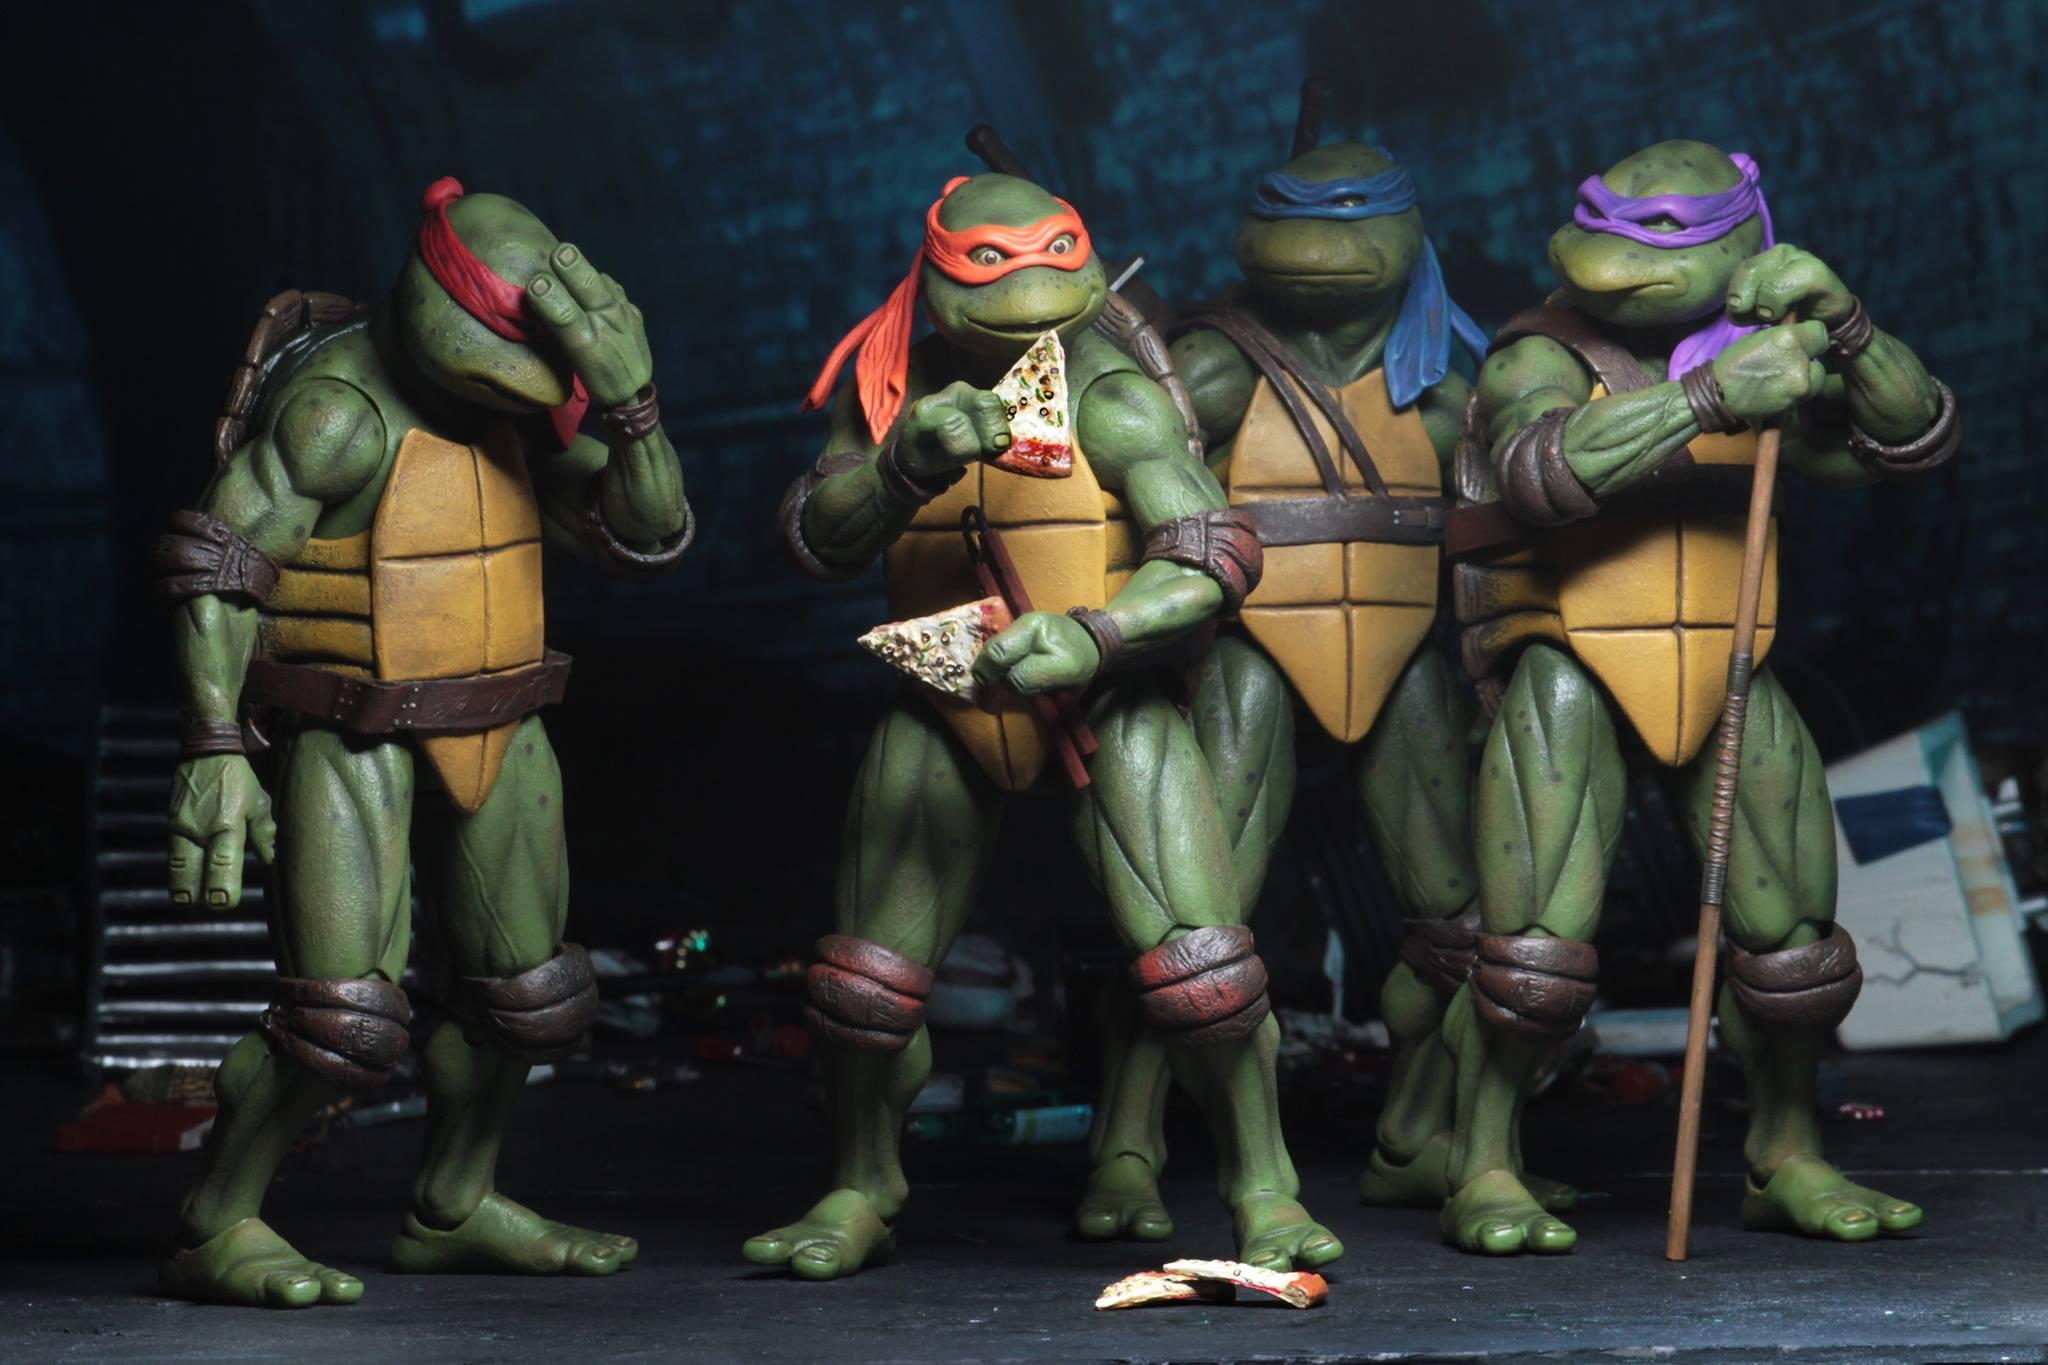 Neca Unveils An Awesome Line Of Teenage Mutant Ninja Turtles 1990 Movie Action Figures Geektyrant